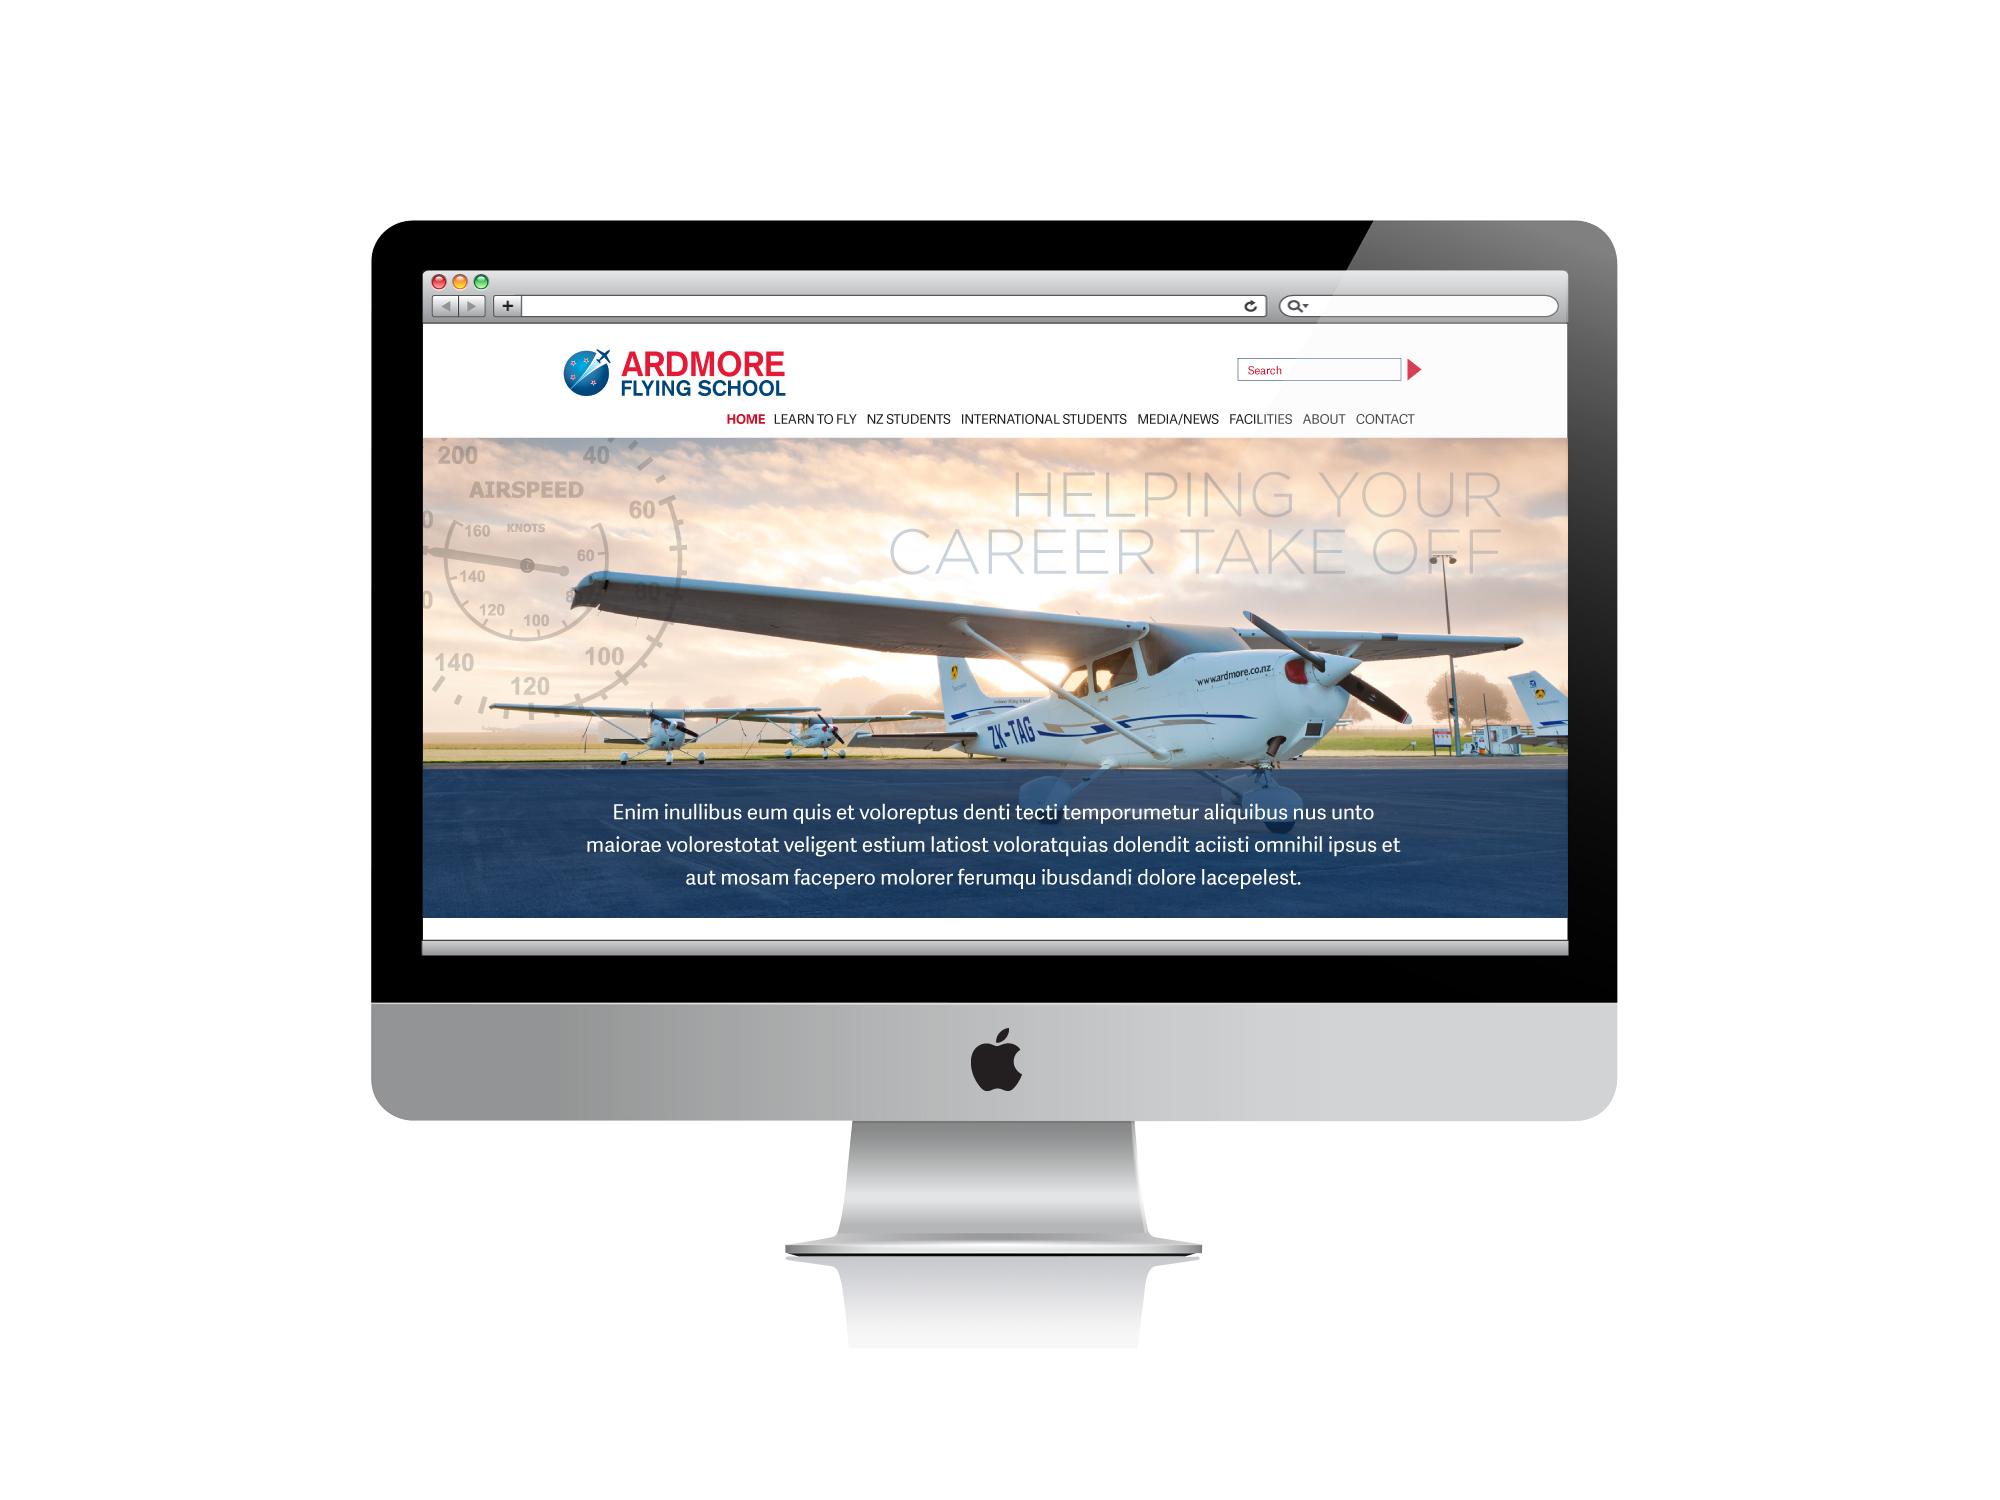 ardmore_fs_website